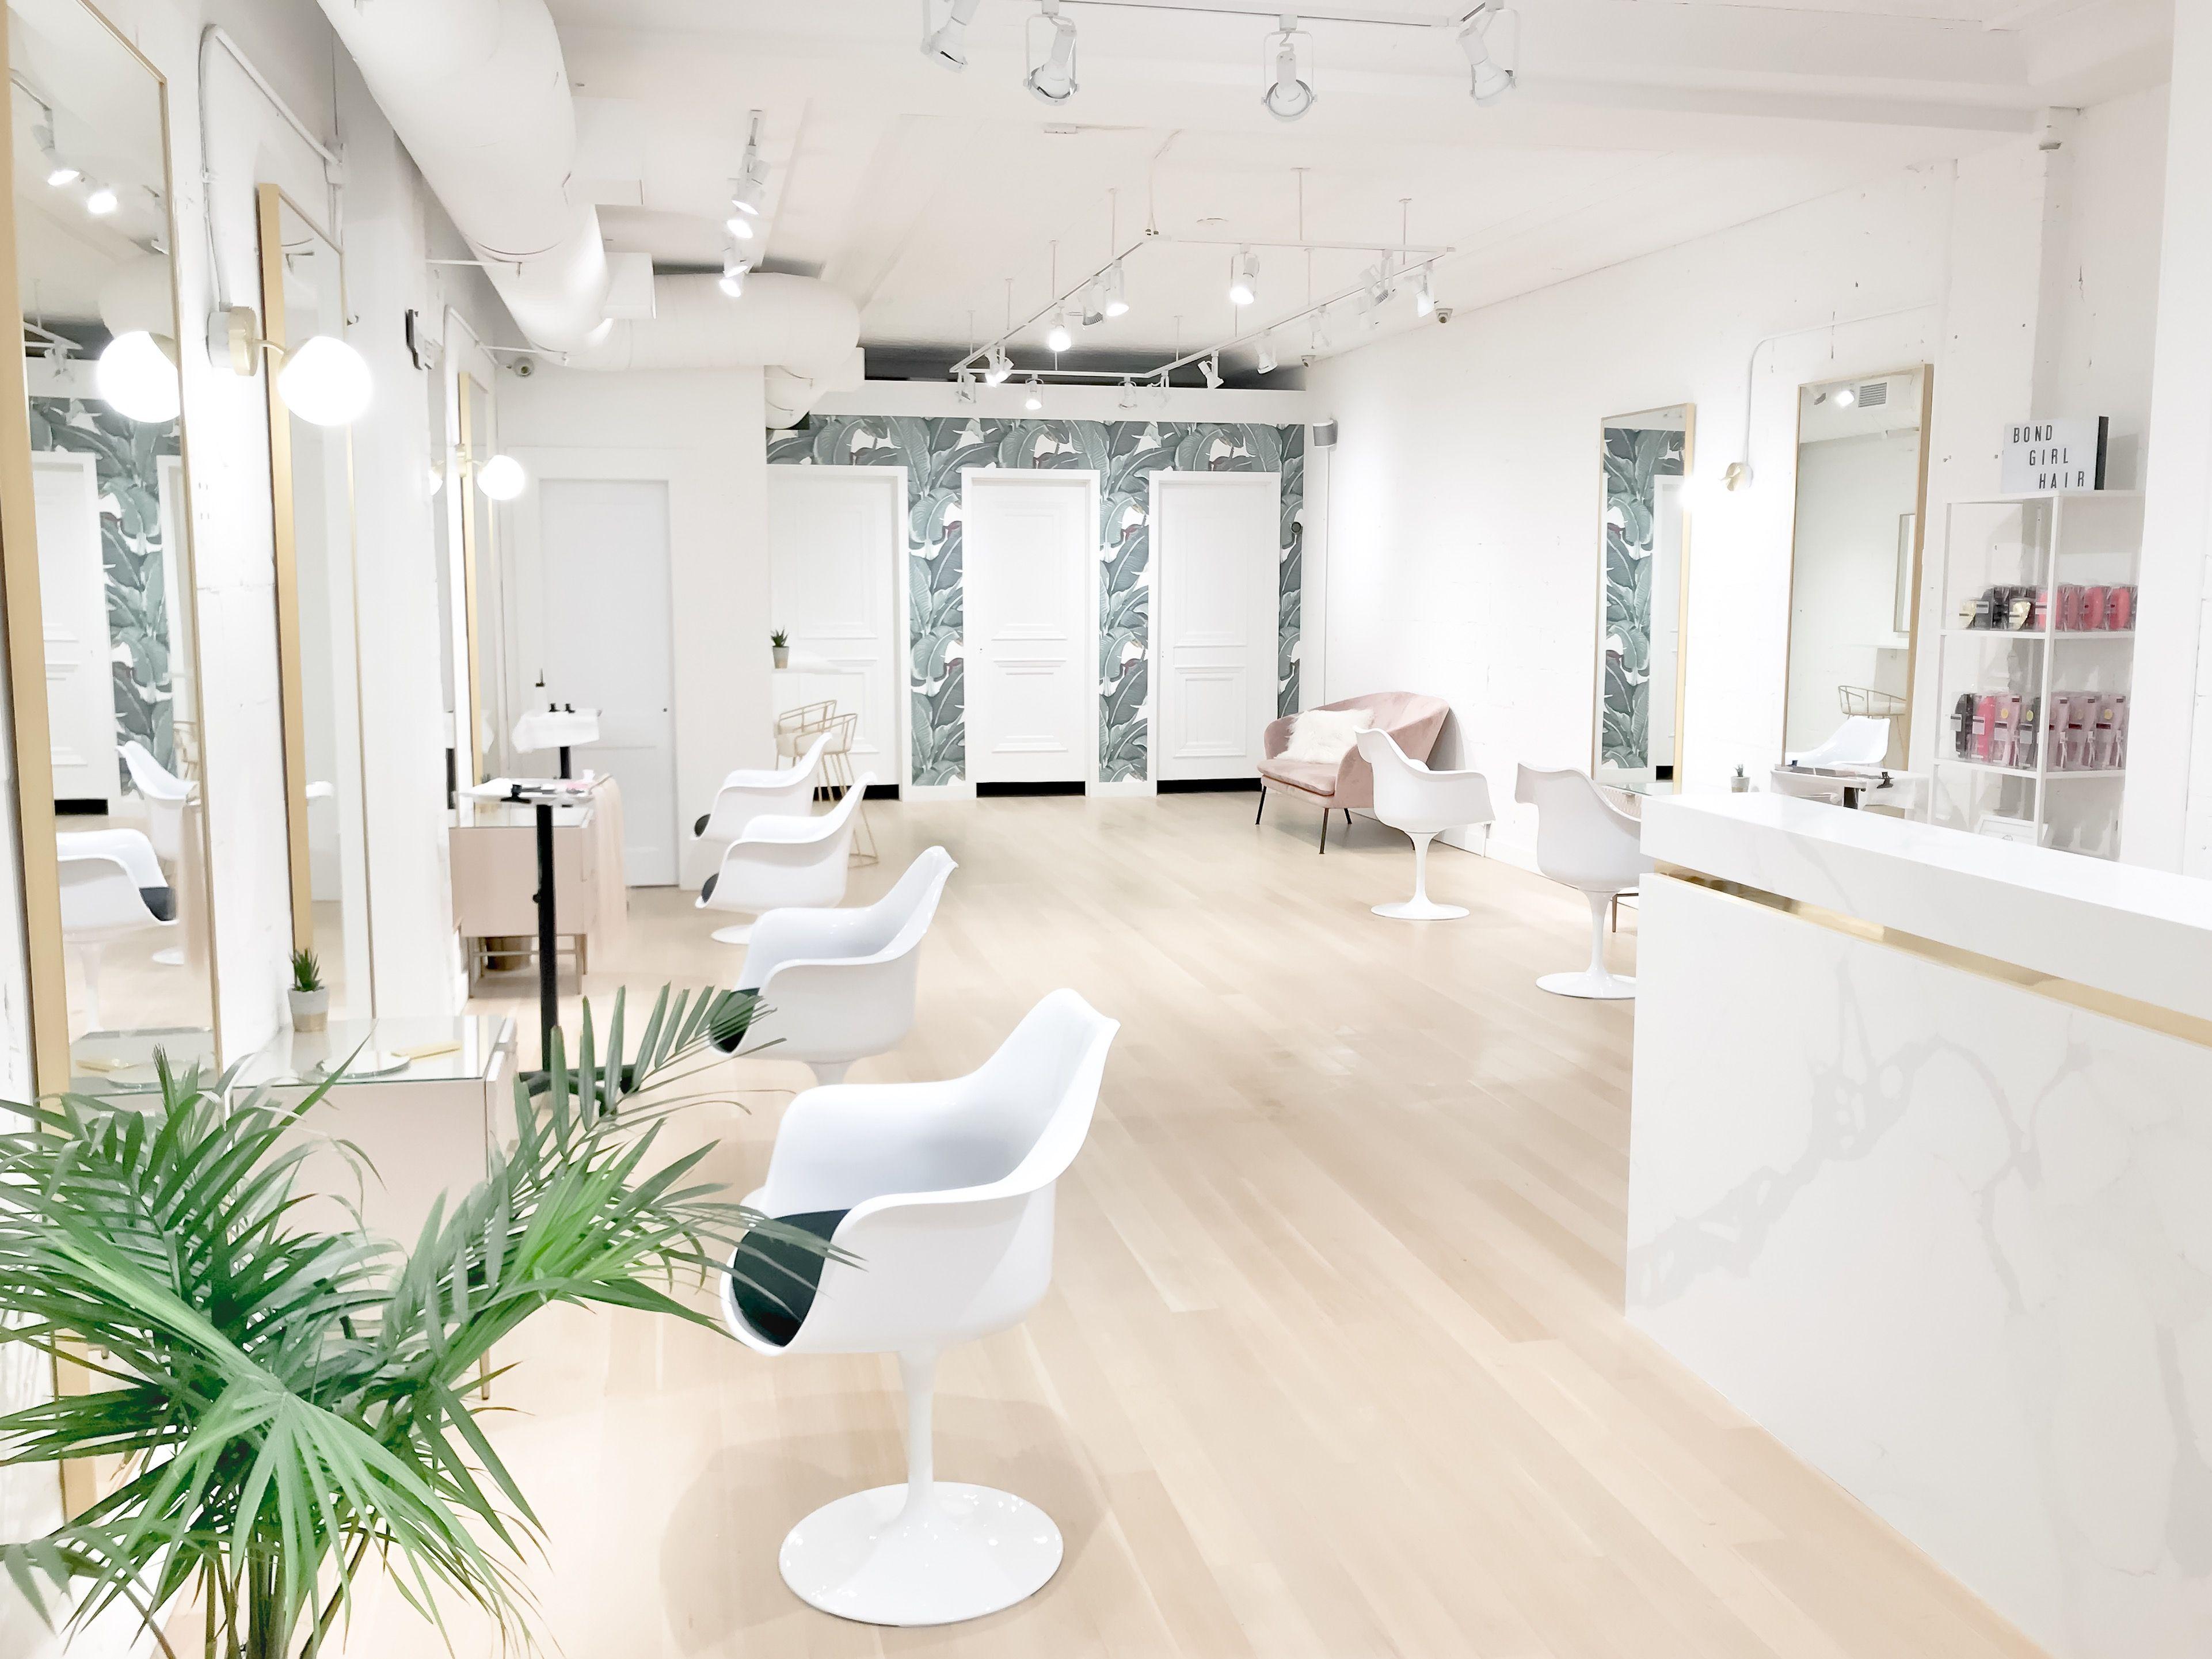 Hair salon design  Formal living room decor, Salon interior